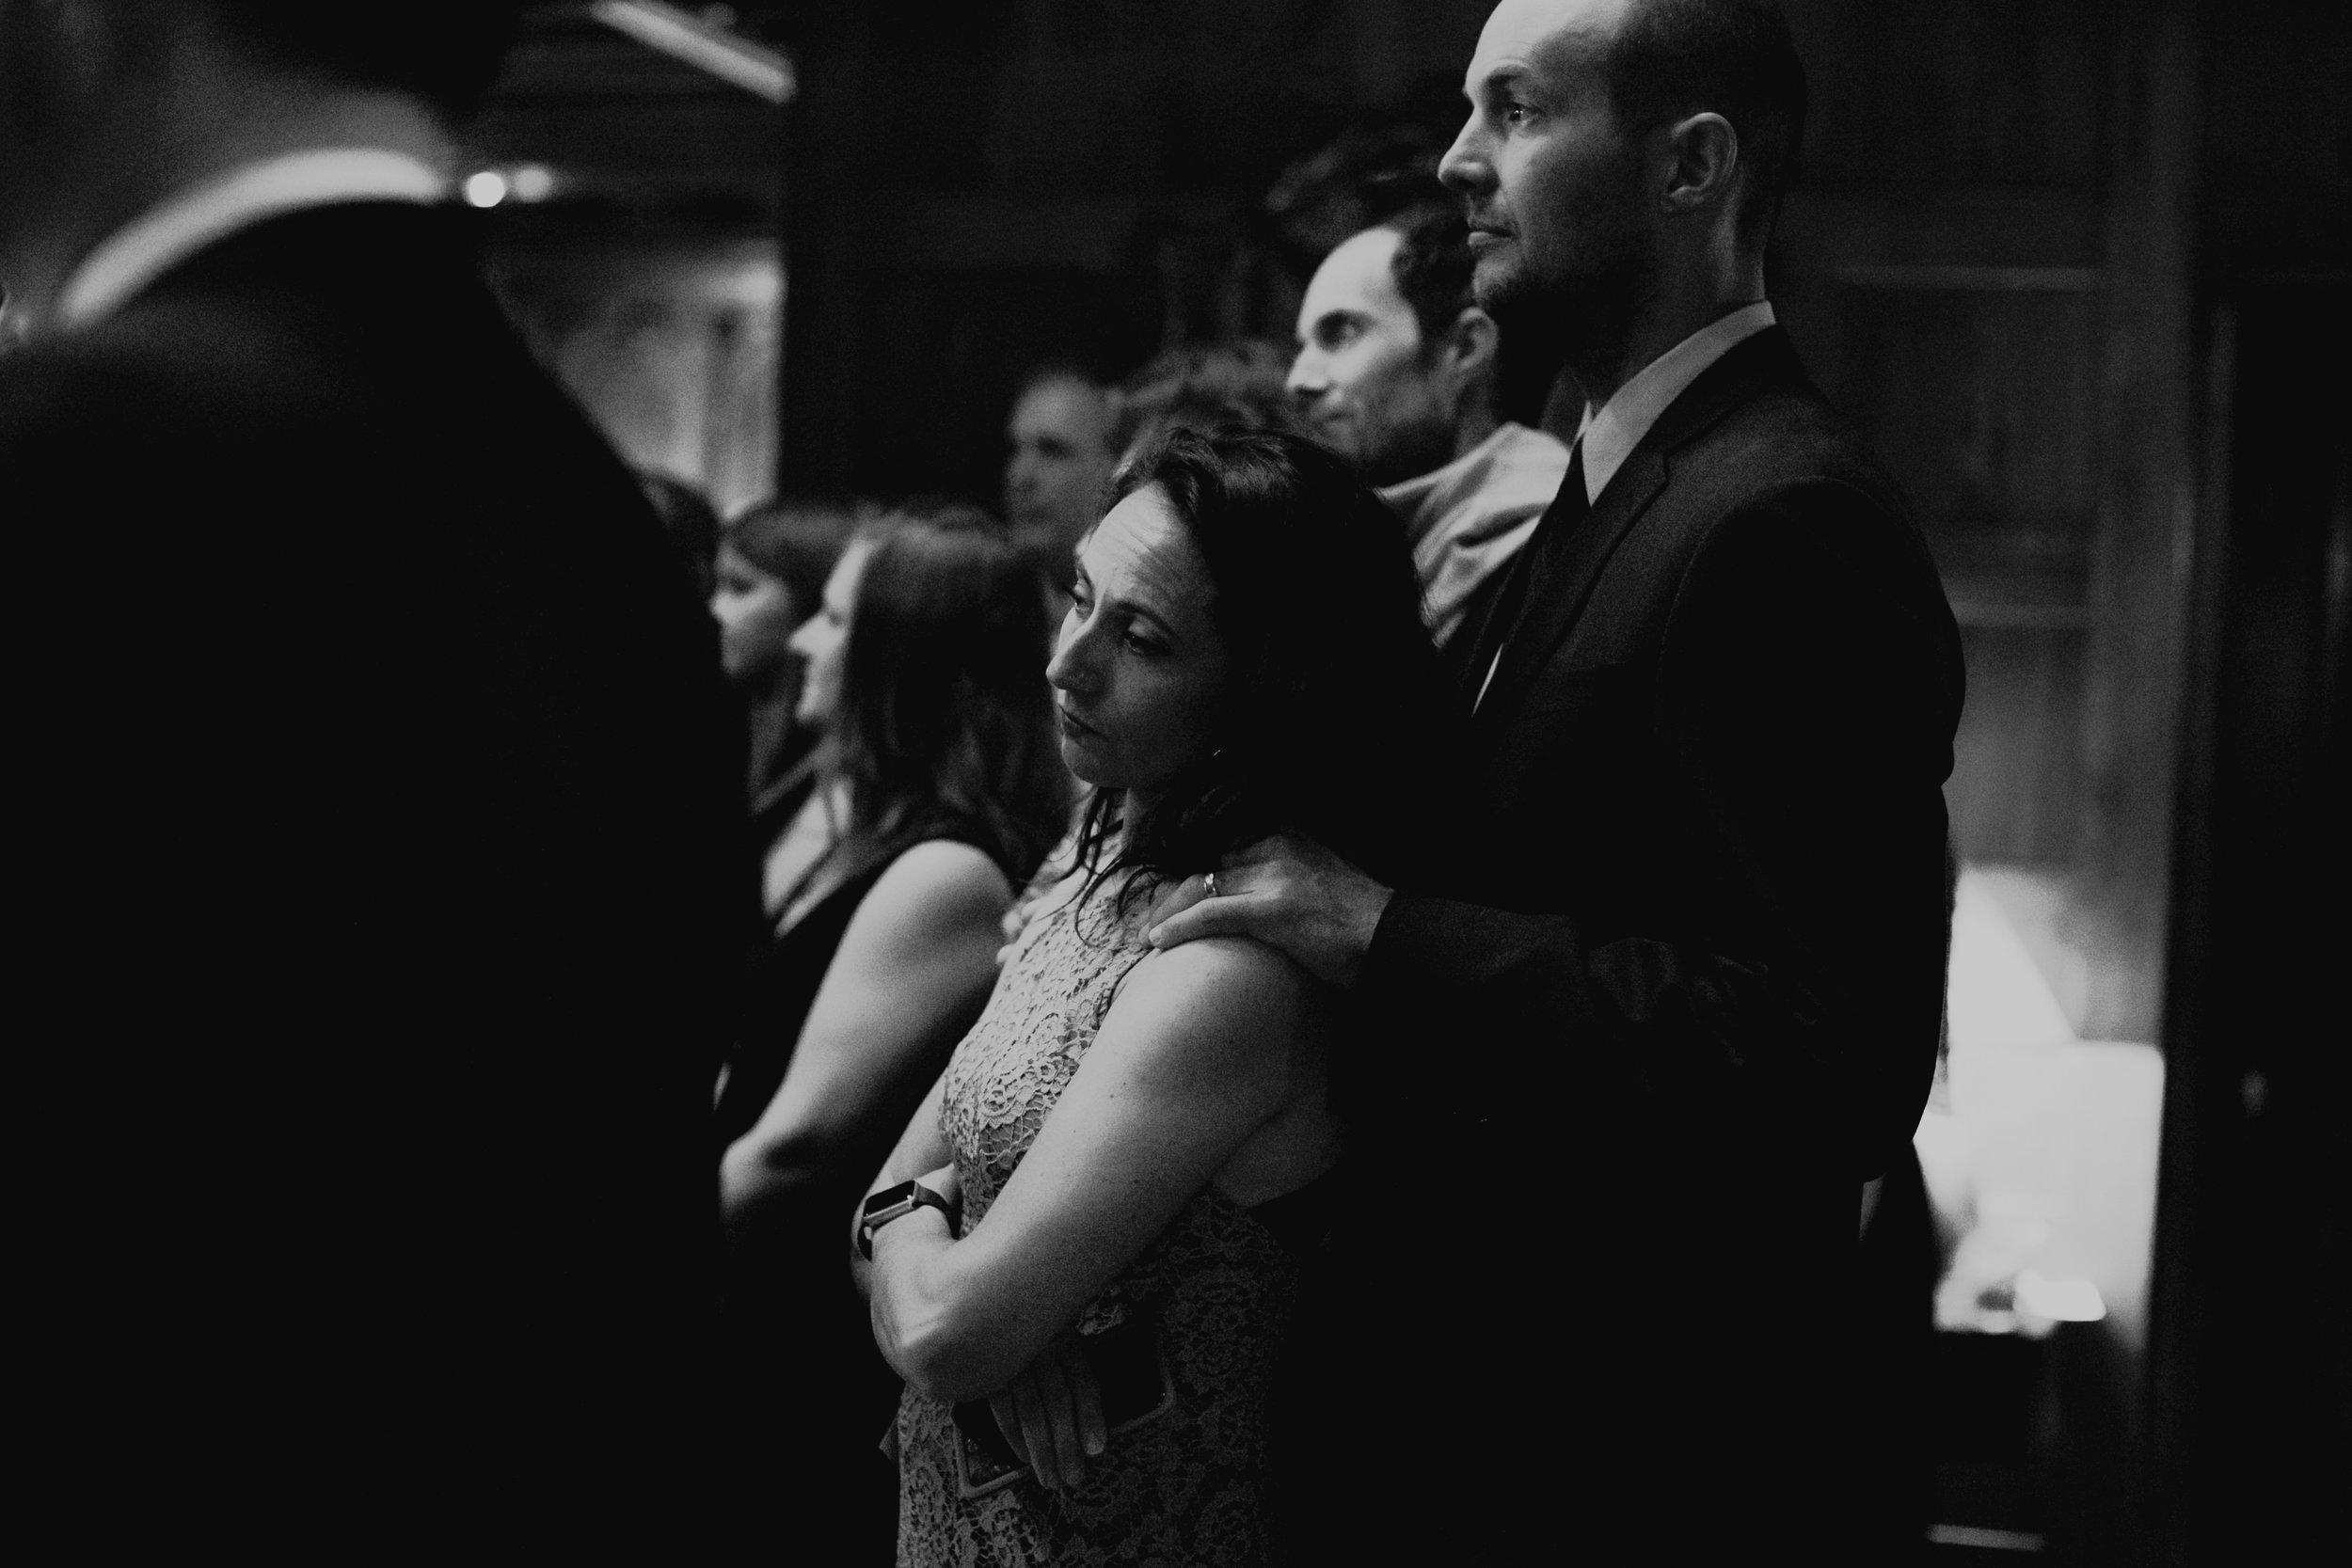 Tiger_House_The_Inn_at_Hudson-Wedding_Chellise_Michael_Photography-216.jpg